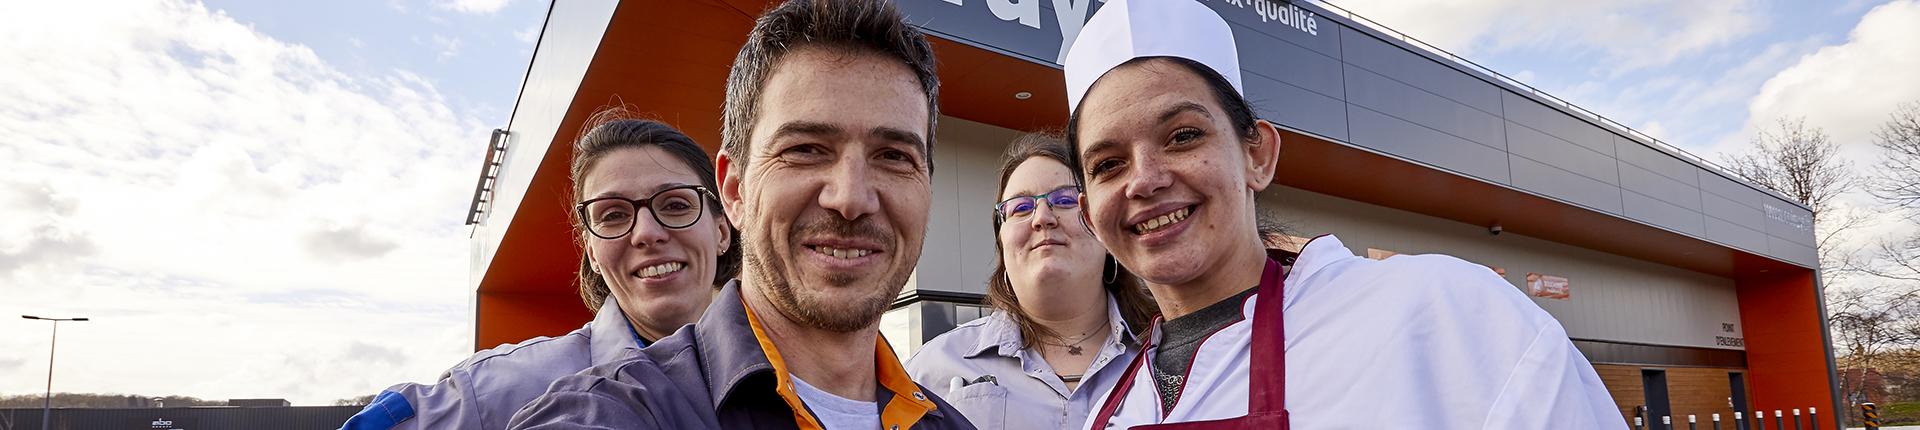 _72A9954 selfie colruyt miserey salines equipe façade d